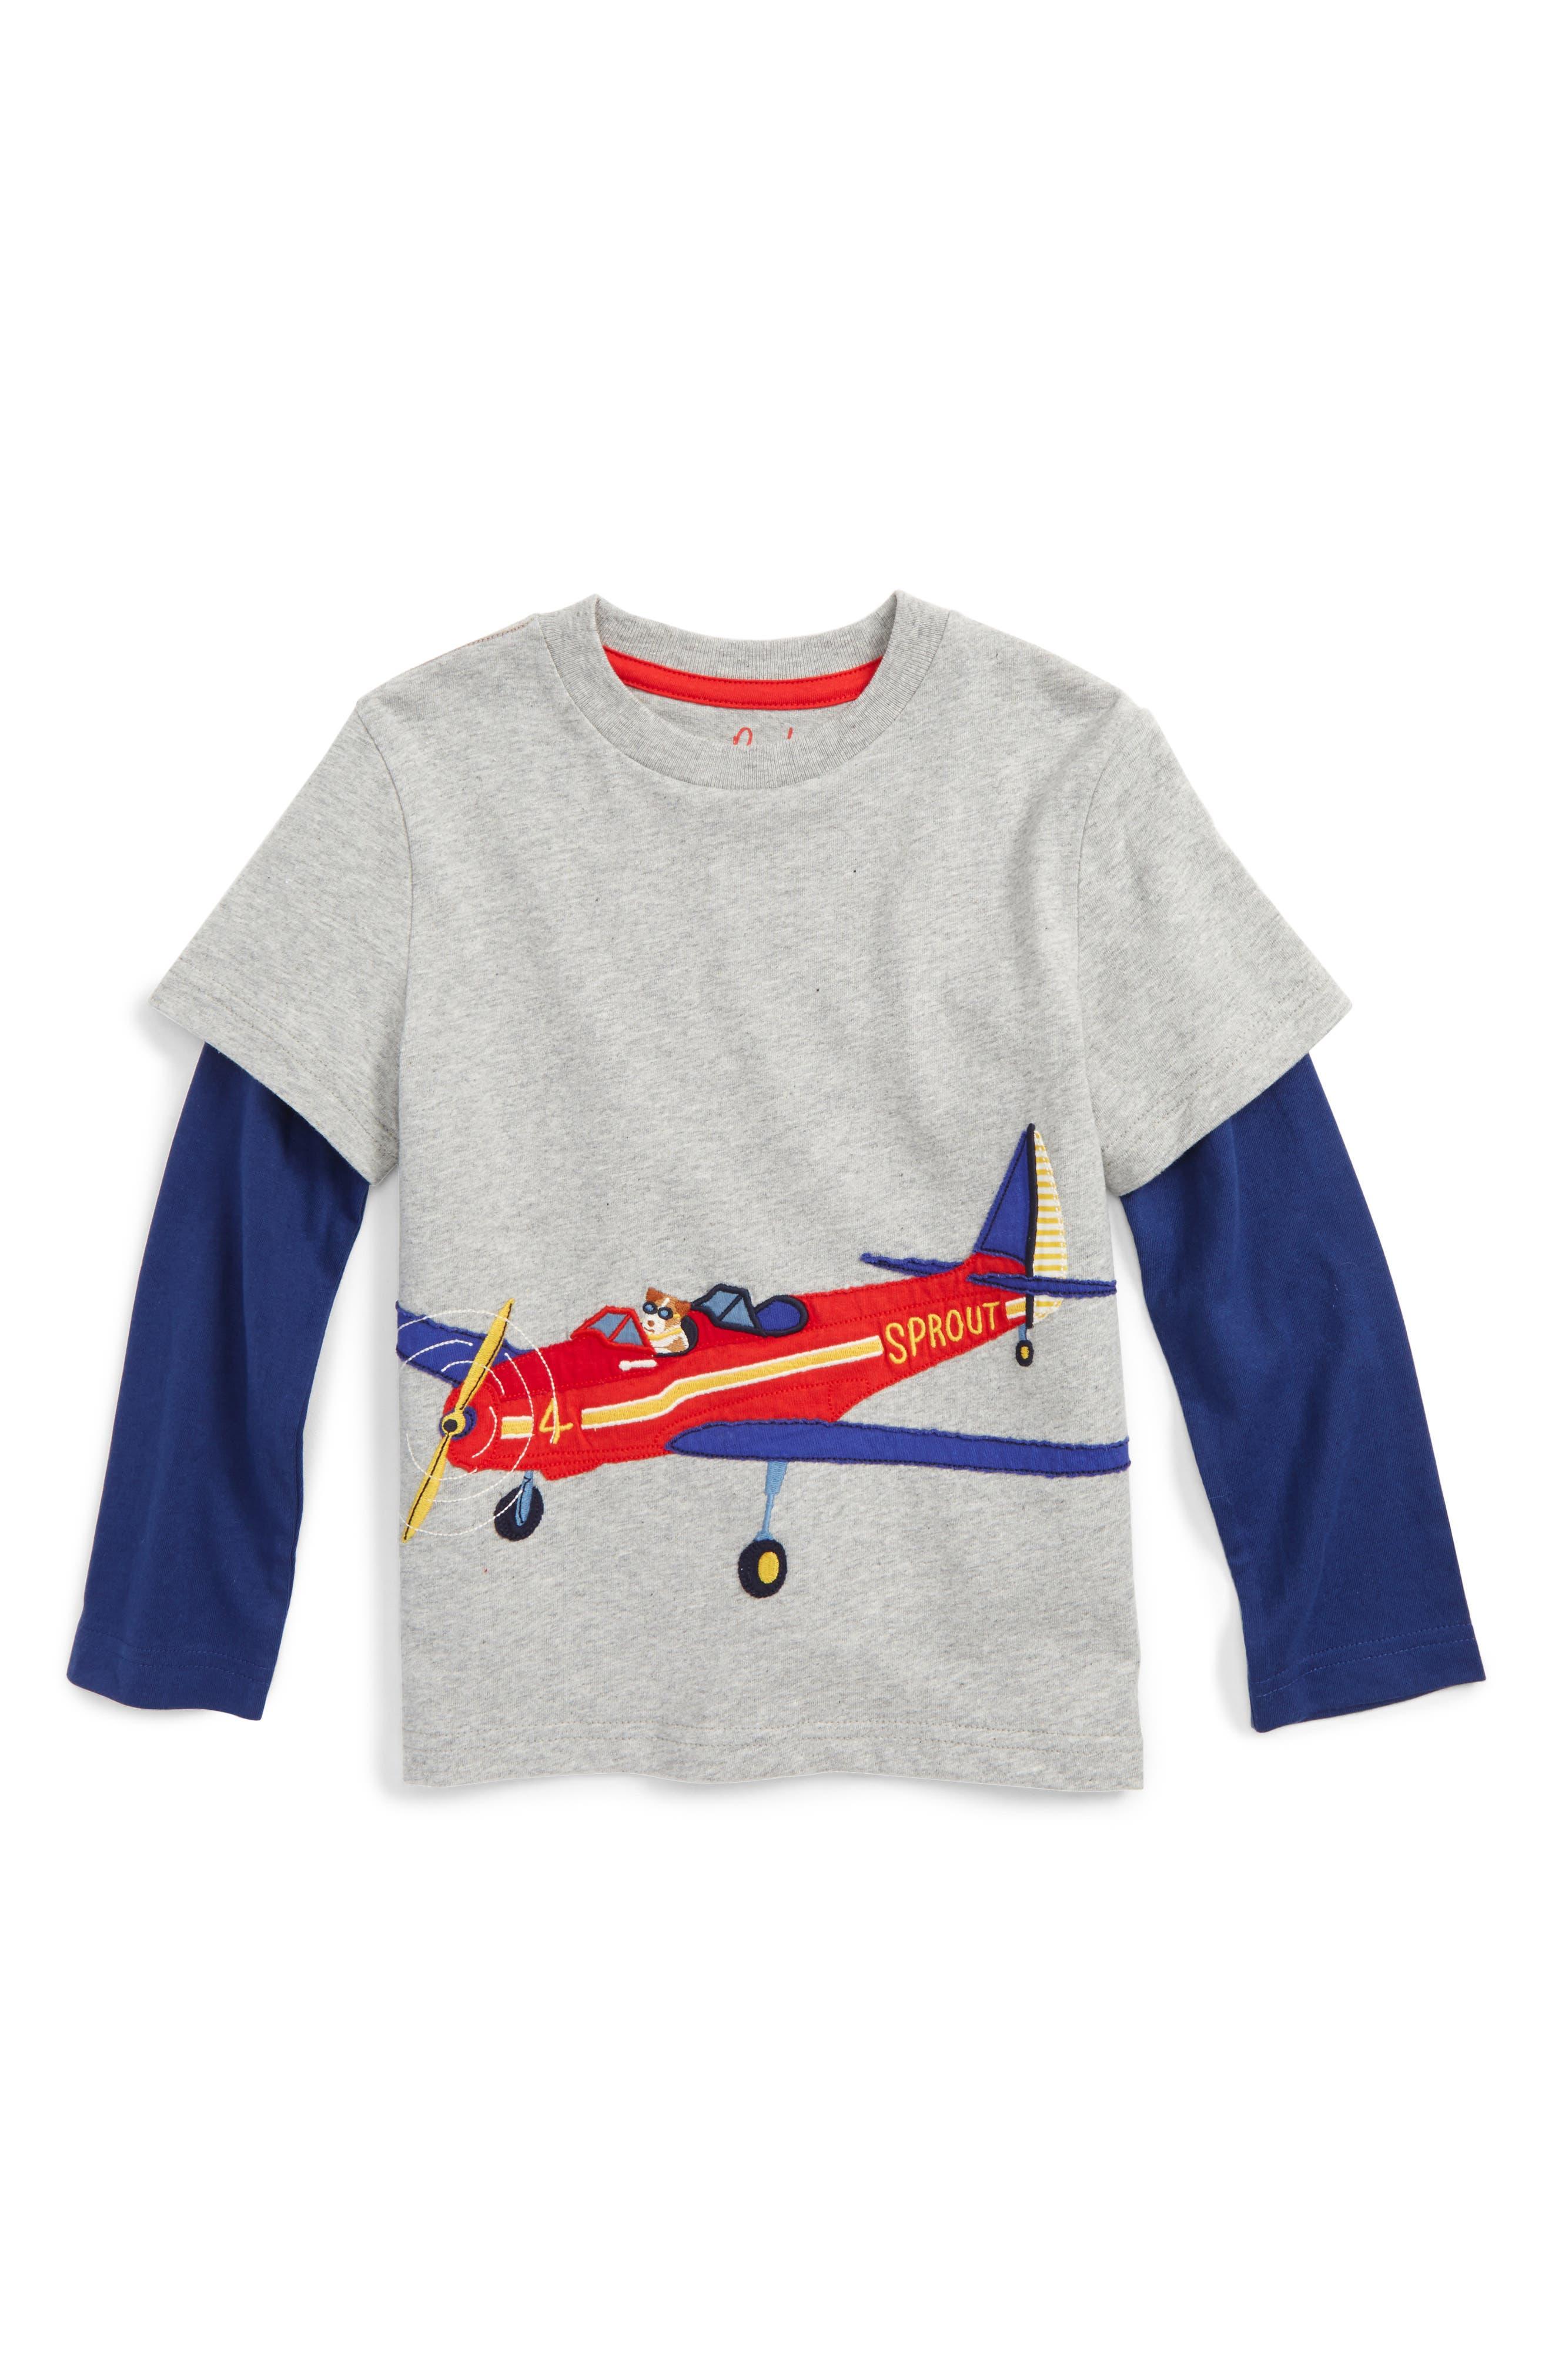 Alternate Image 1 Selected - Mini Boden Vehicle Appliqué Layer T-Shirt (Toddler Boys, Little Boys & Big Boys)